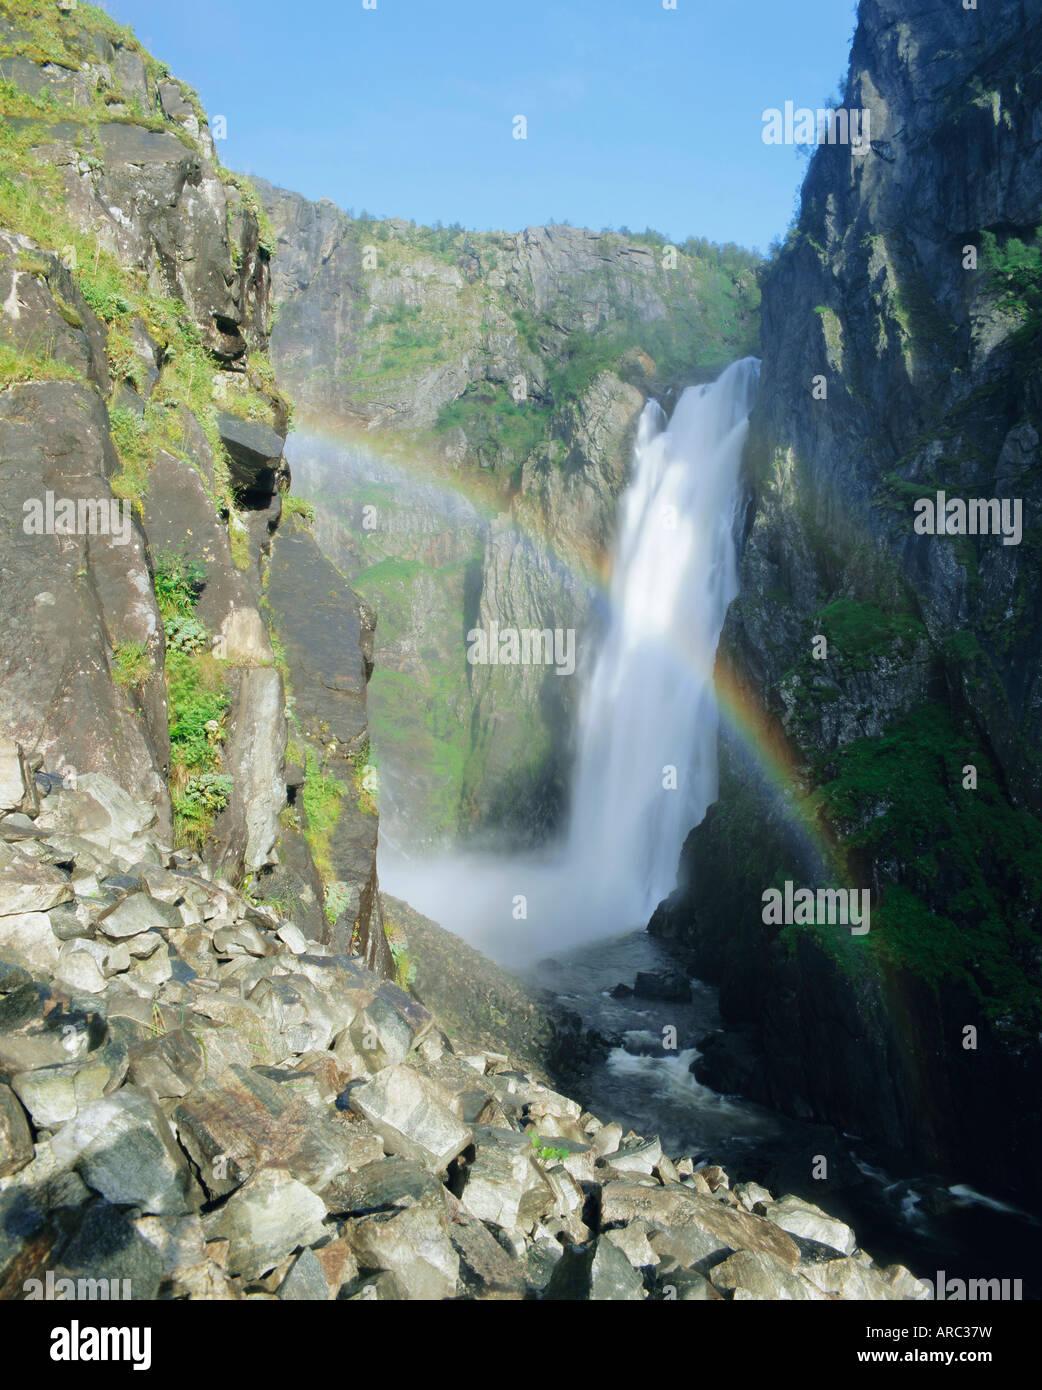 Rainbow and Voringsfossen waterfall, Hardanger region, Norway, Scandinavia, Europe - Stock Image